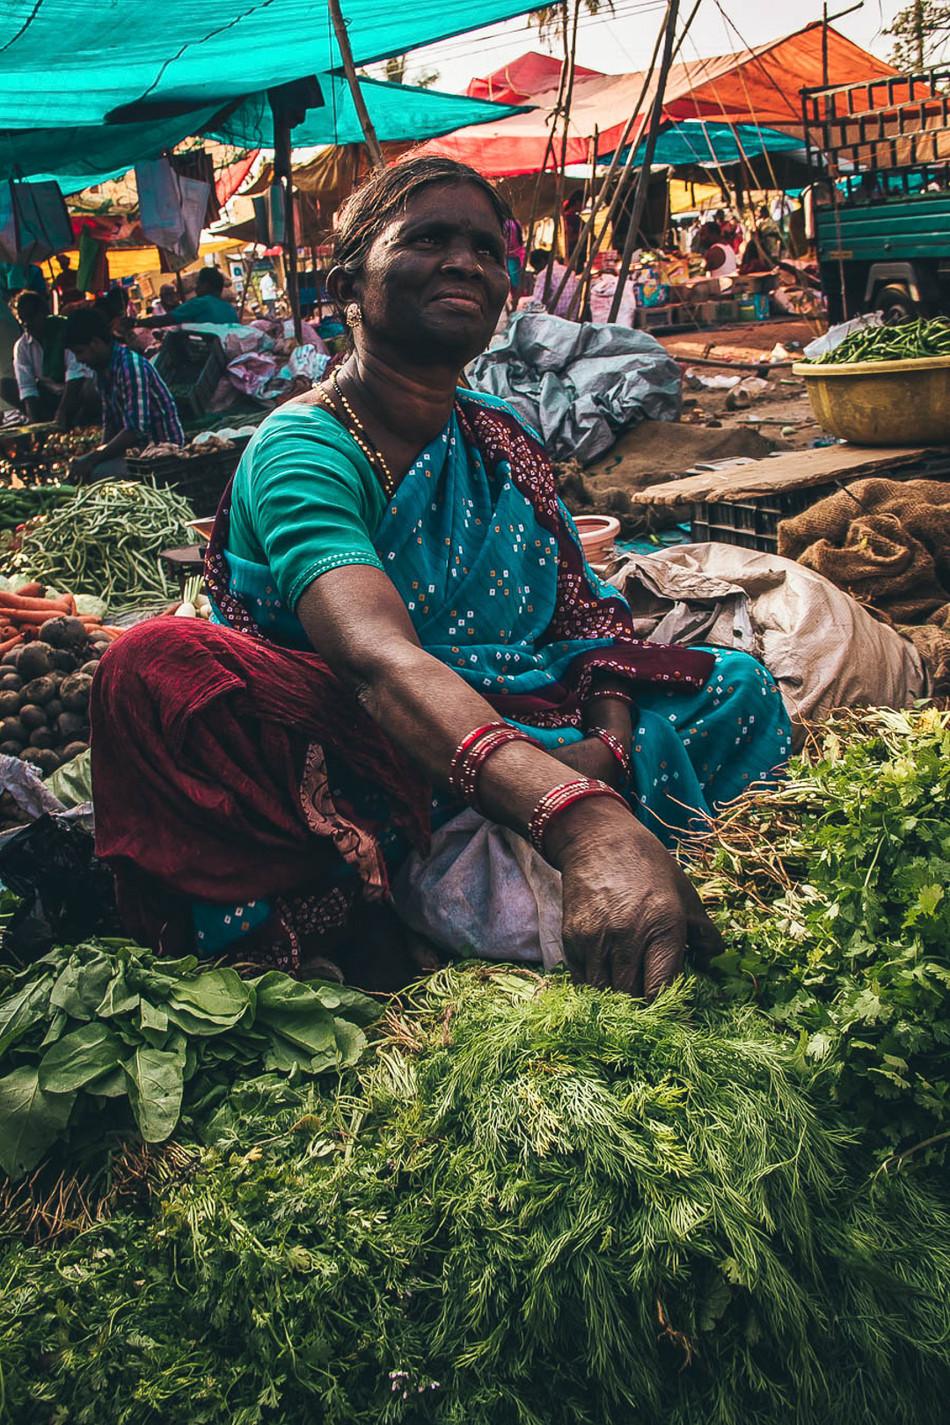 woman sells at the market